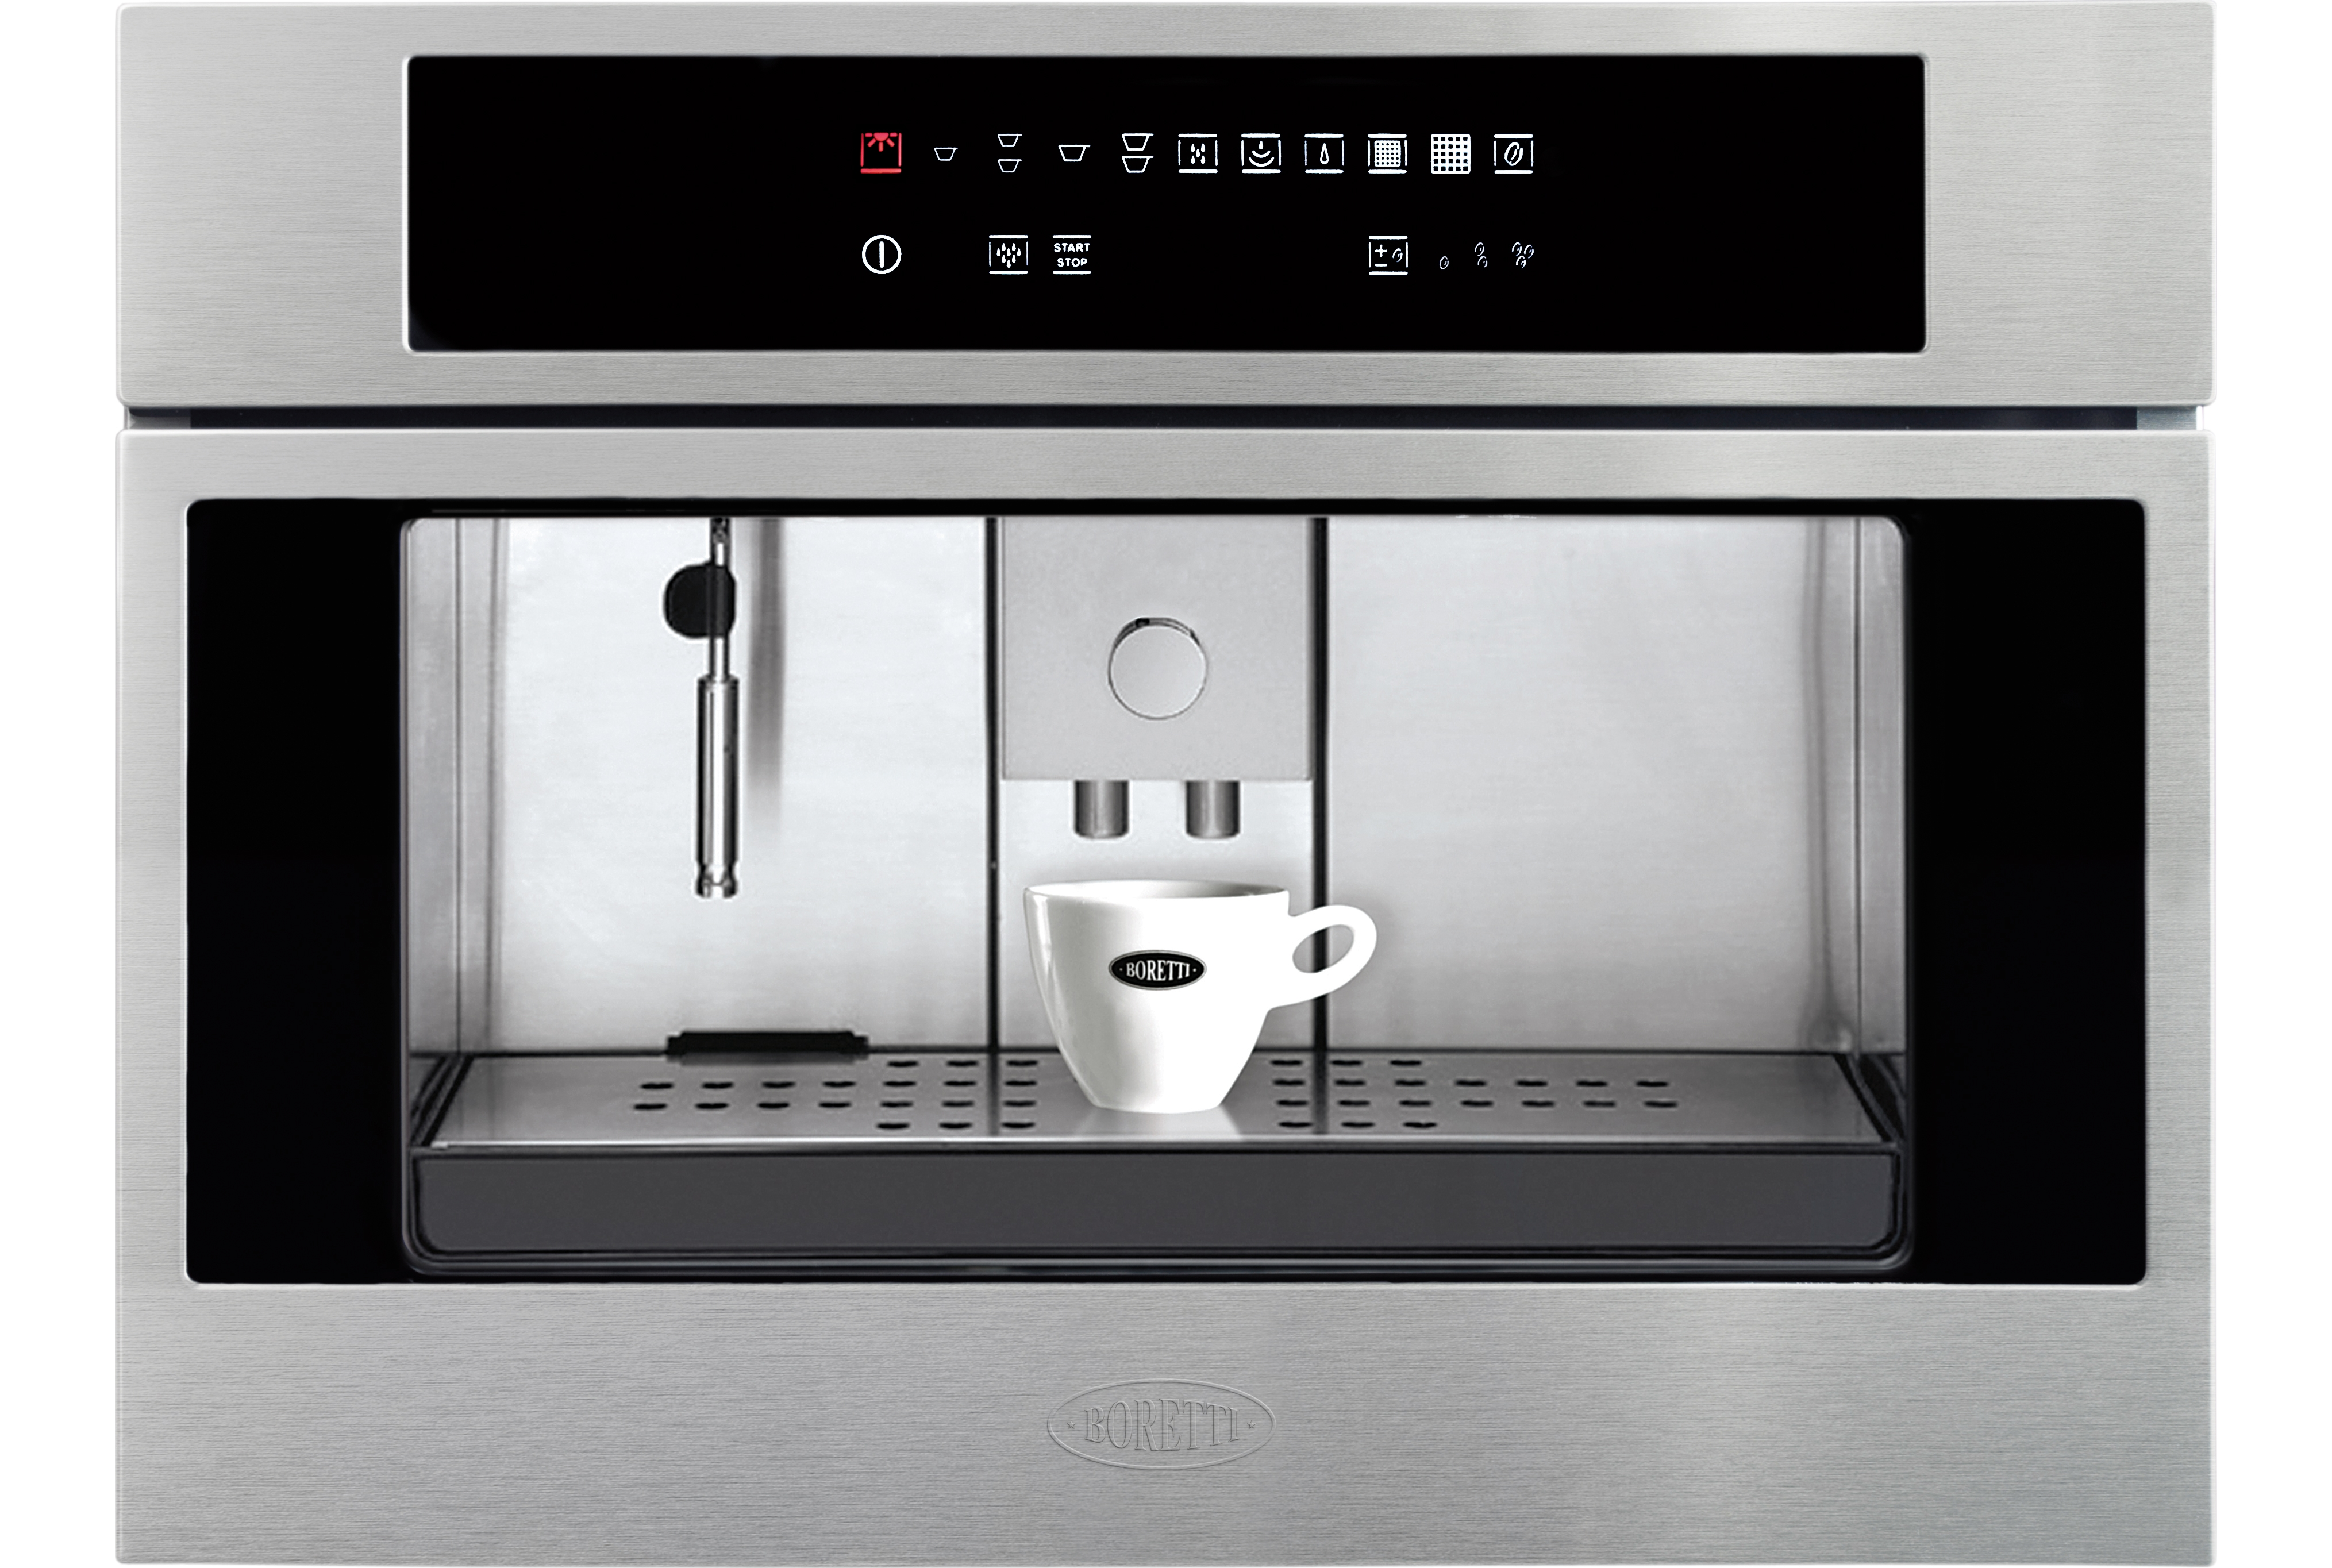 Koffiemachine De Keuken : Boretti bpk45ix koffiemachine rvs de schouw witgoed